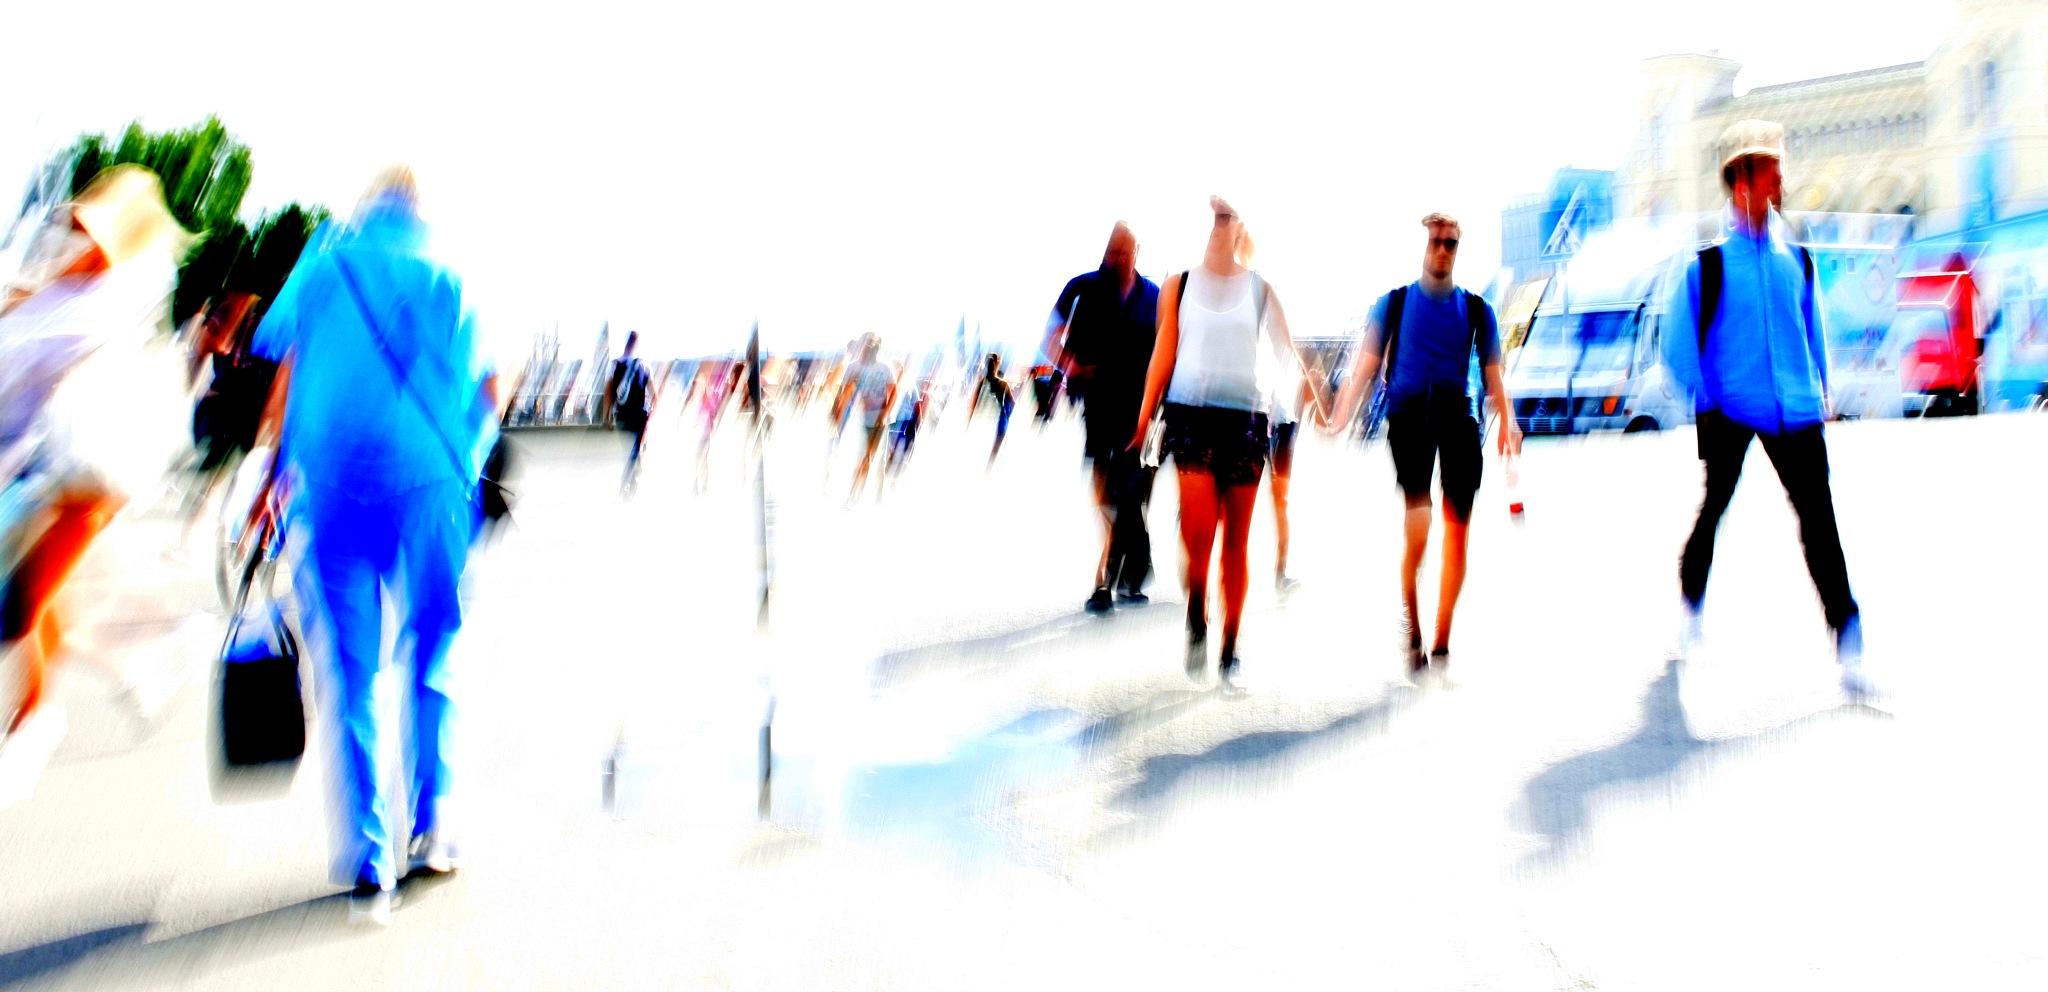 Movement Oslo by Lasse Tur